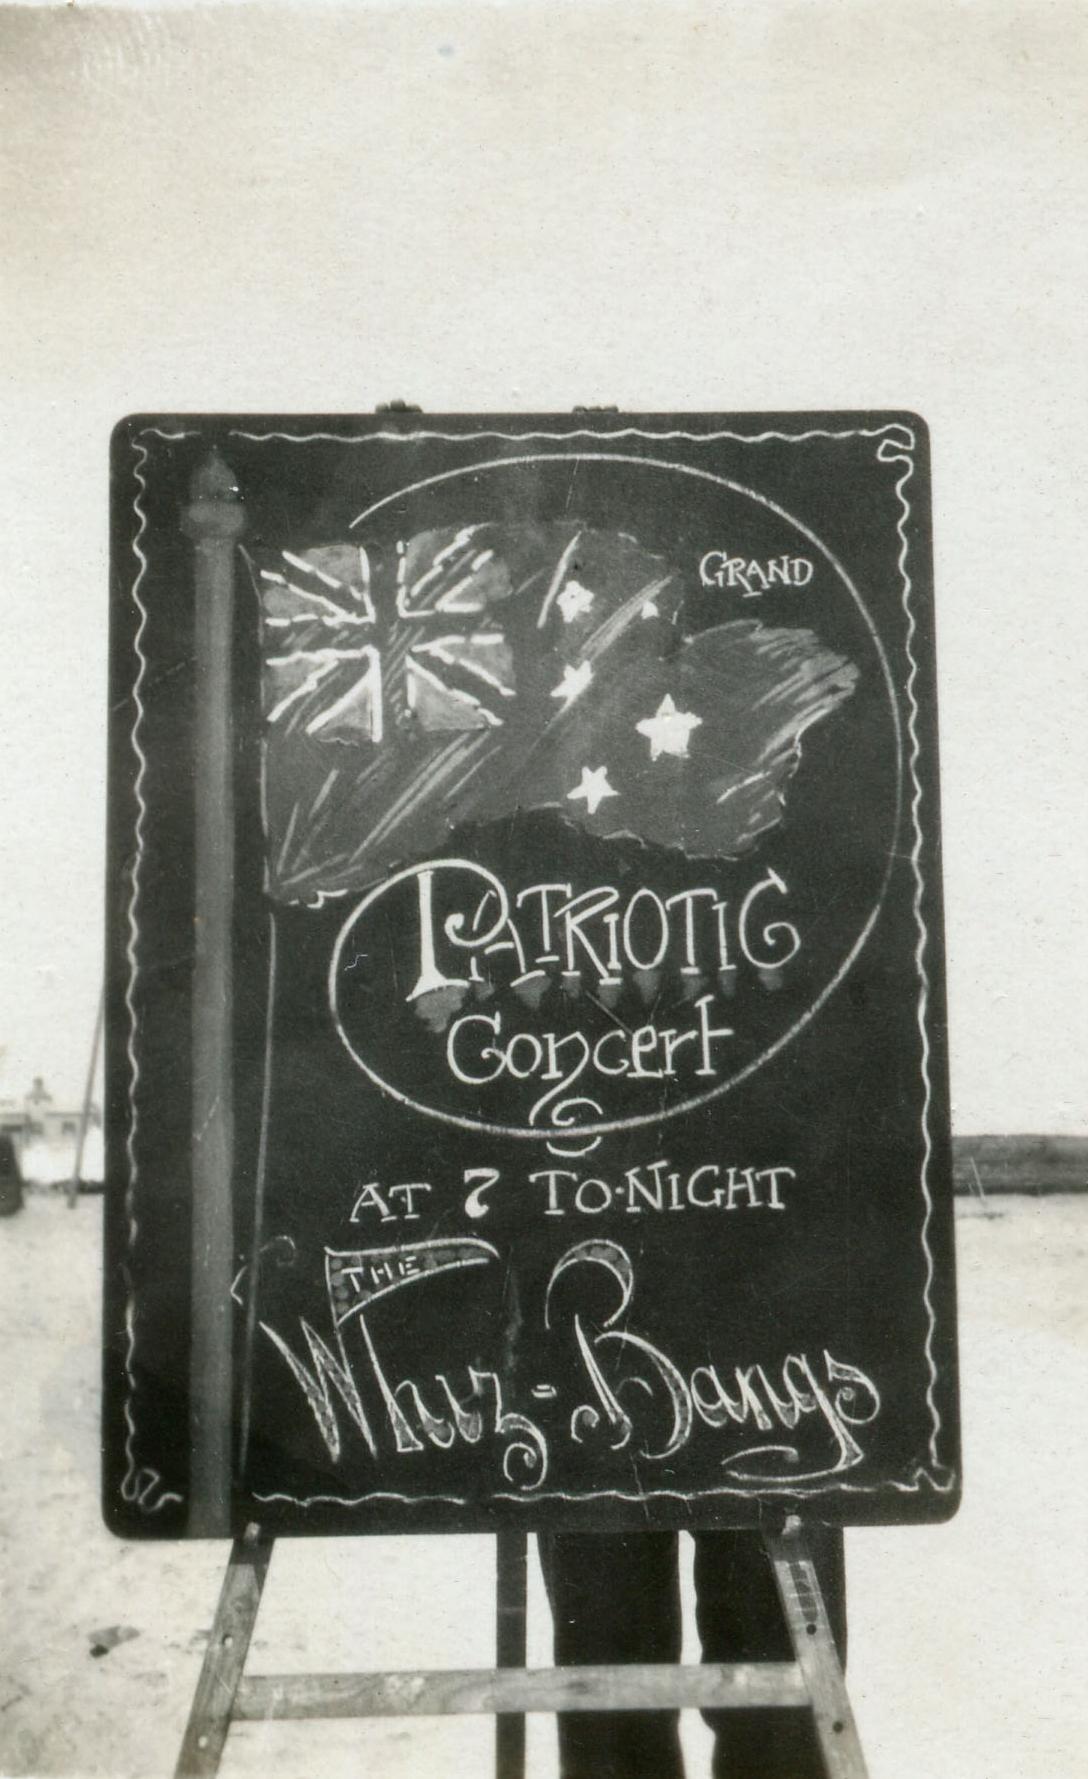 reg walters024 Grand Patriotic Concert Whiz Bangs.jpg